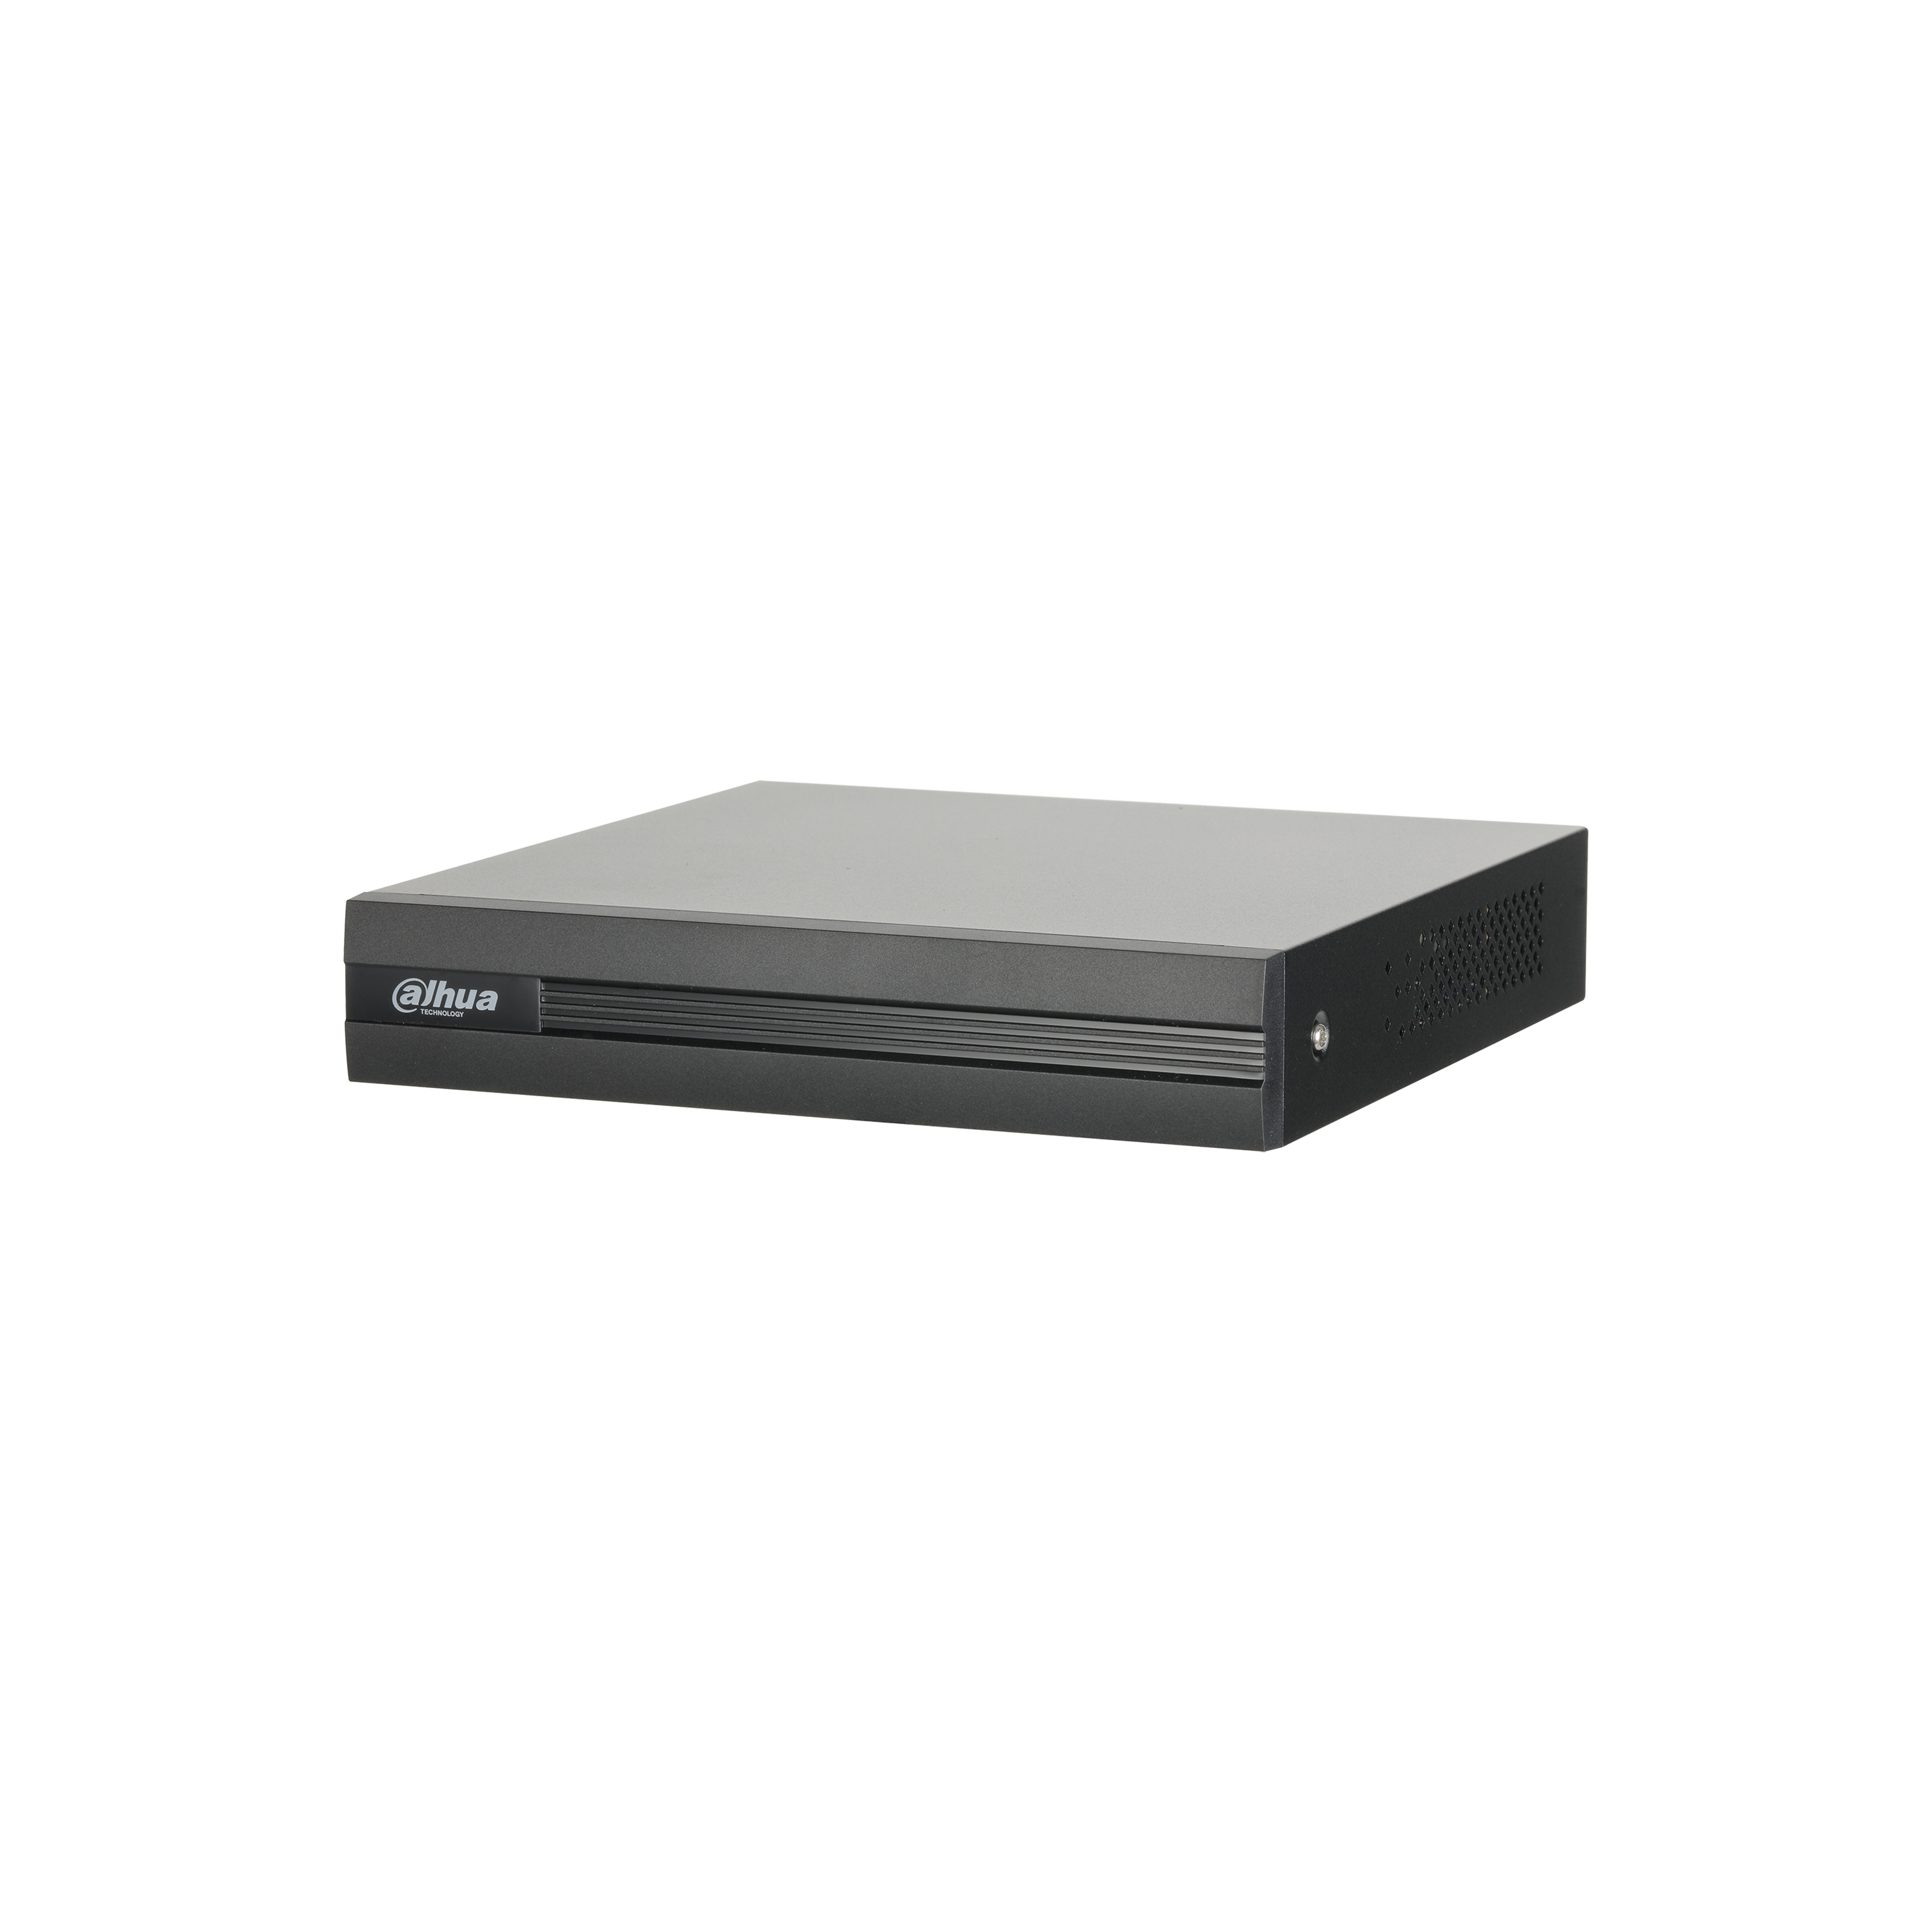 Dahua Technology XVR1B04/08H 4/8 Channel Penta-brid 4M-N/1080P Cooper 1U Digital Video Recorder